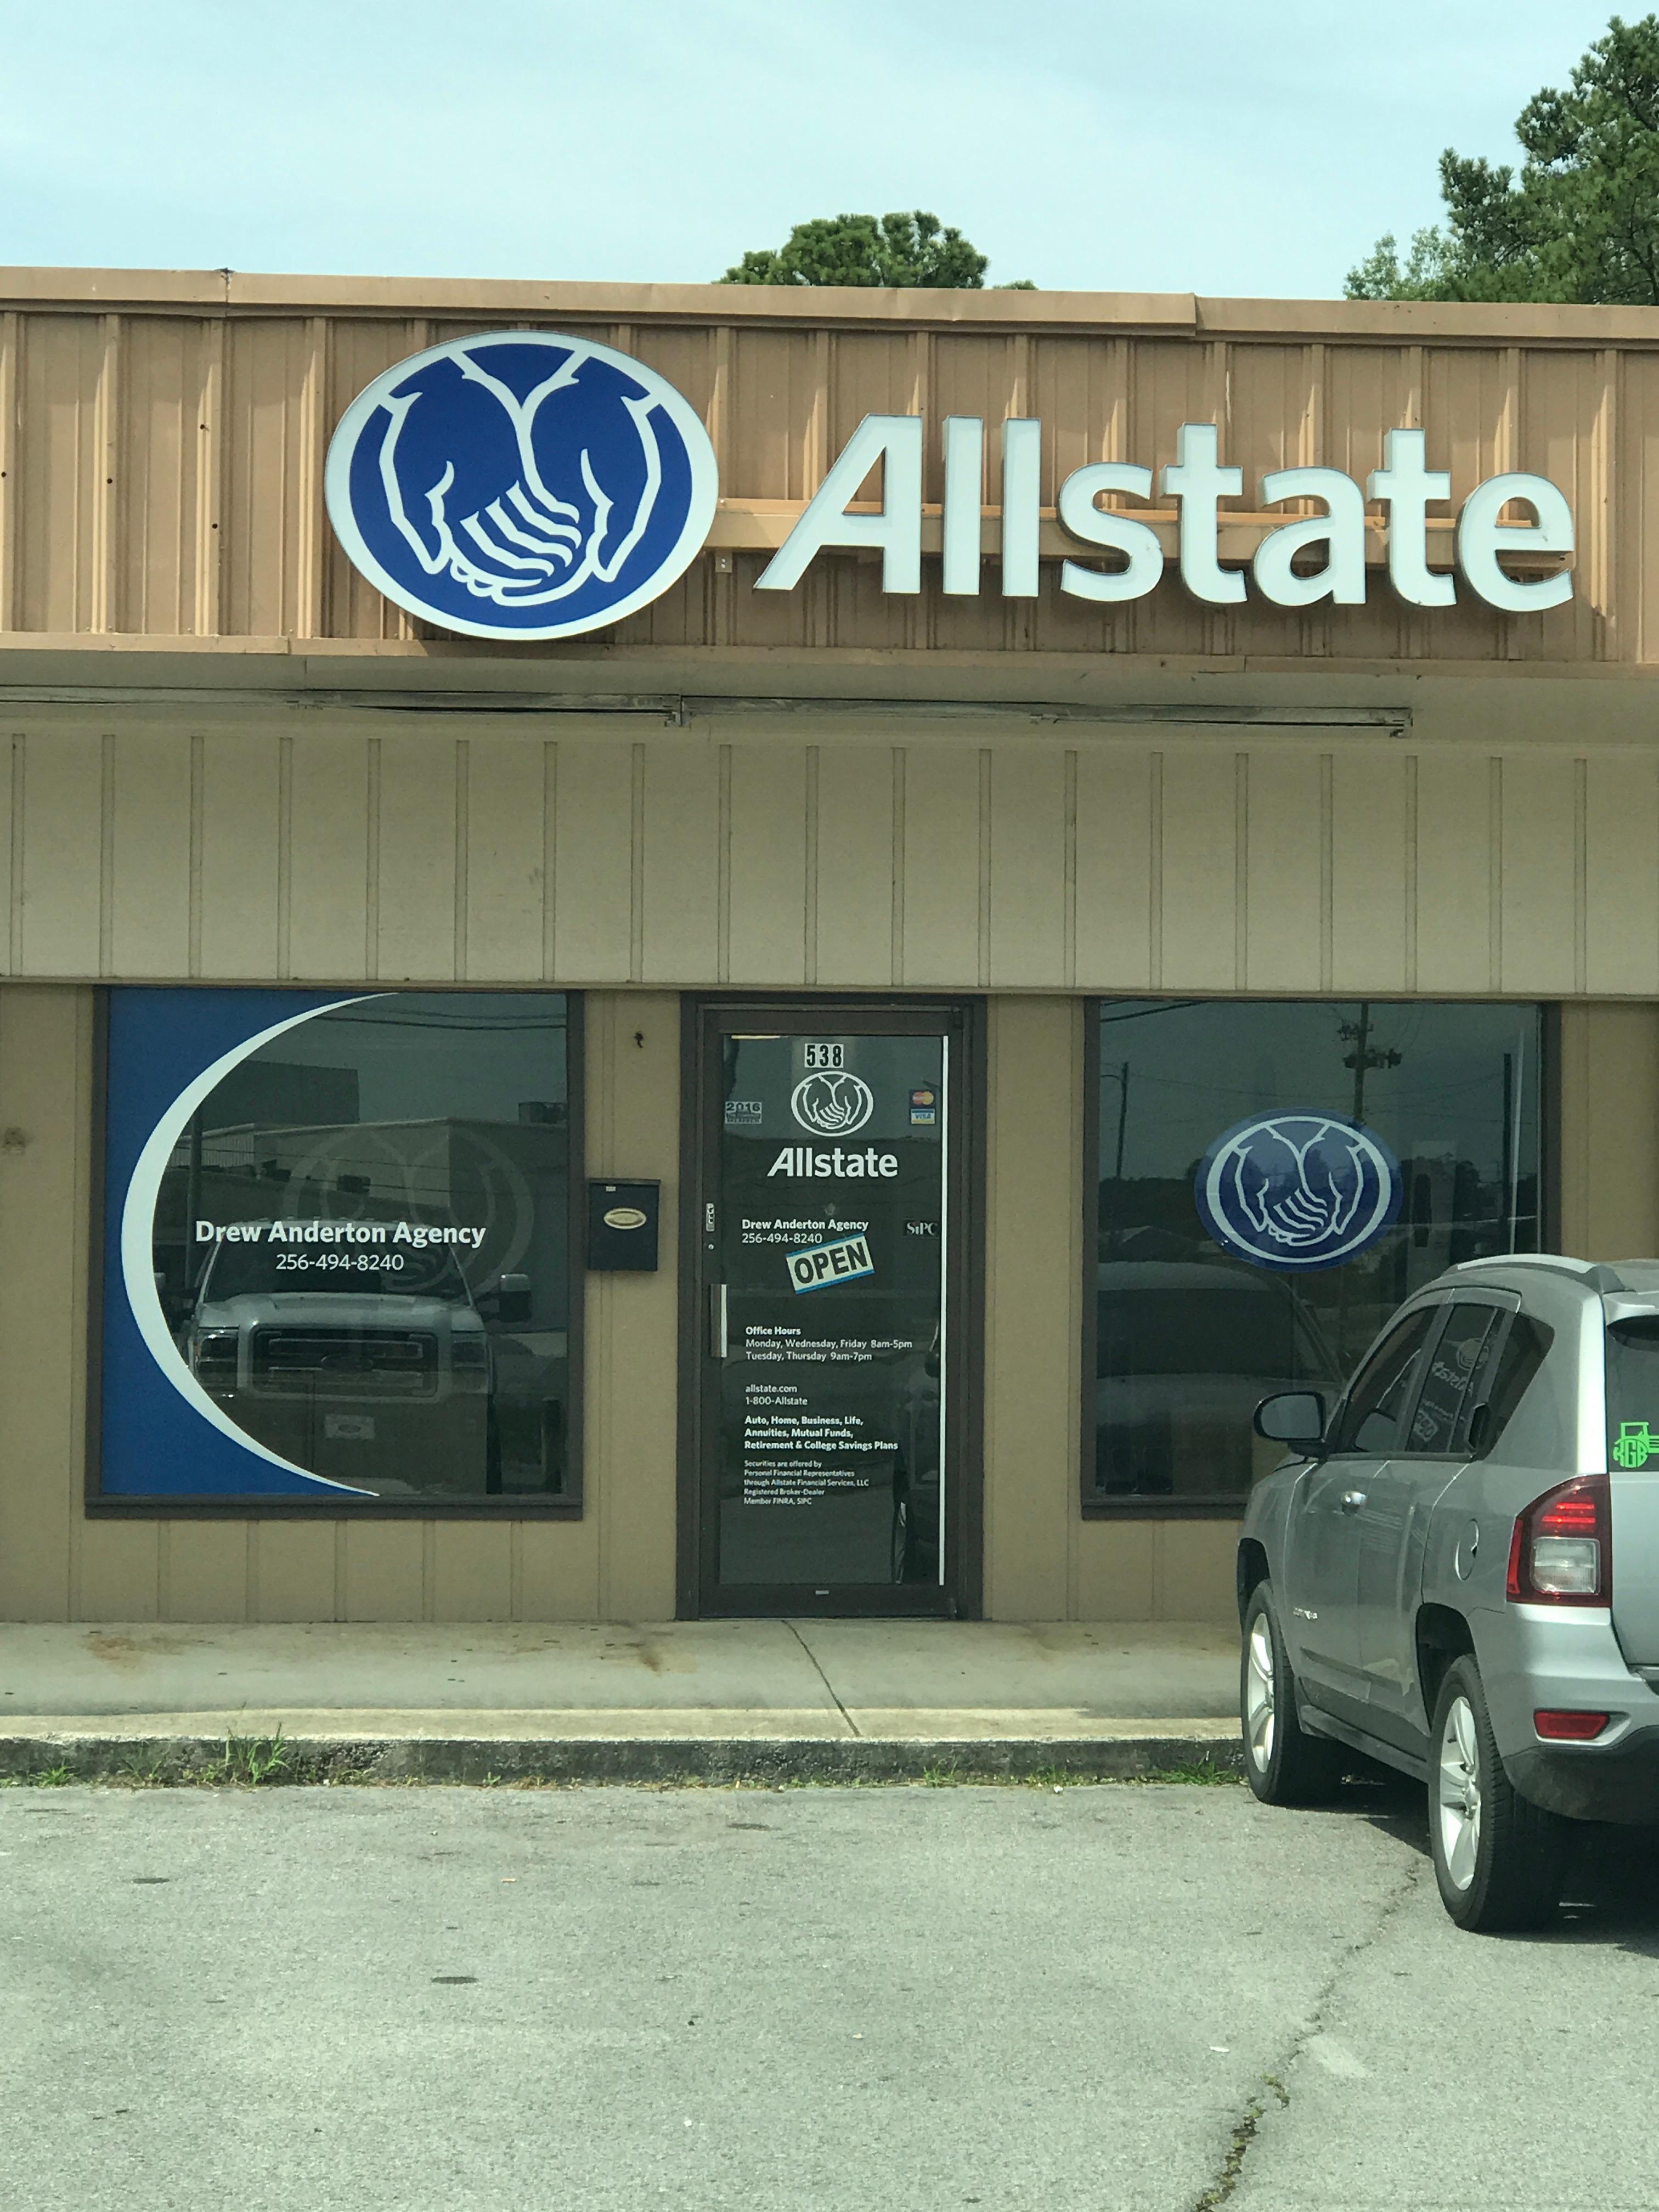 Andrew Anderton: Allstate Insurance image 2